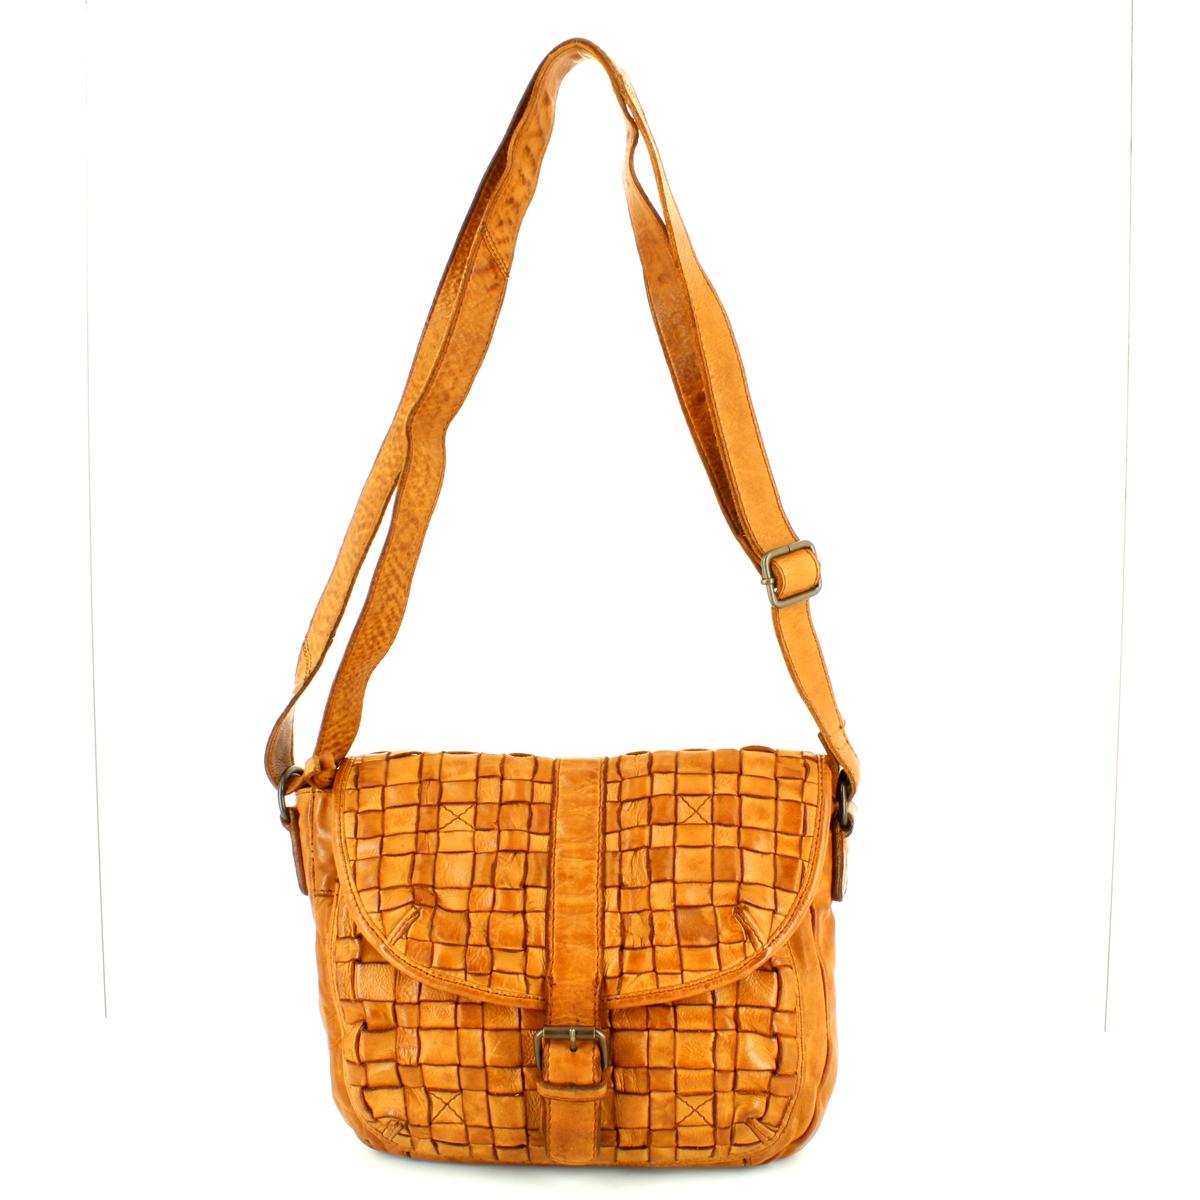 Gianni Conti Handbag Tan 4503357 25 Sml Satch